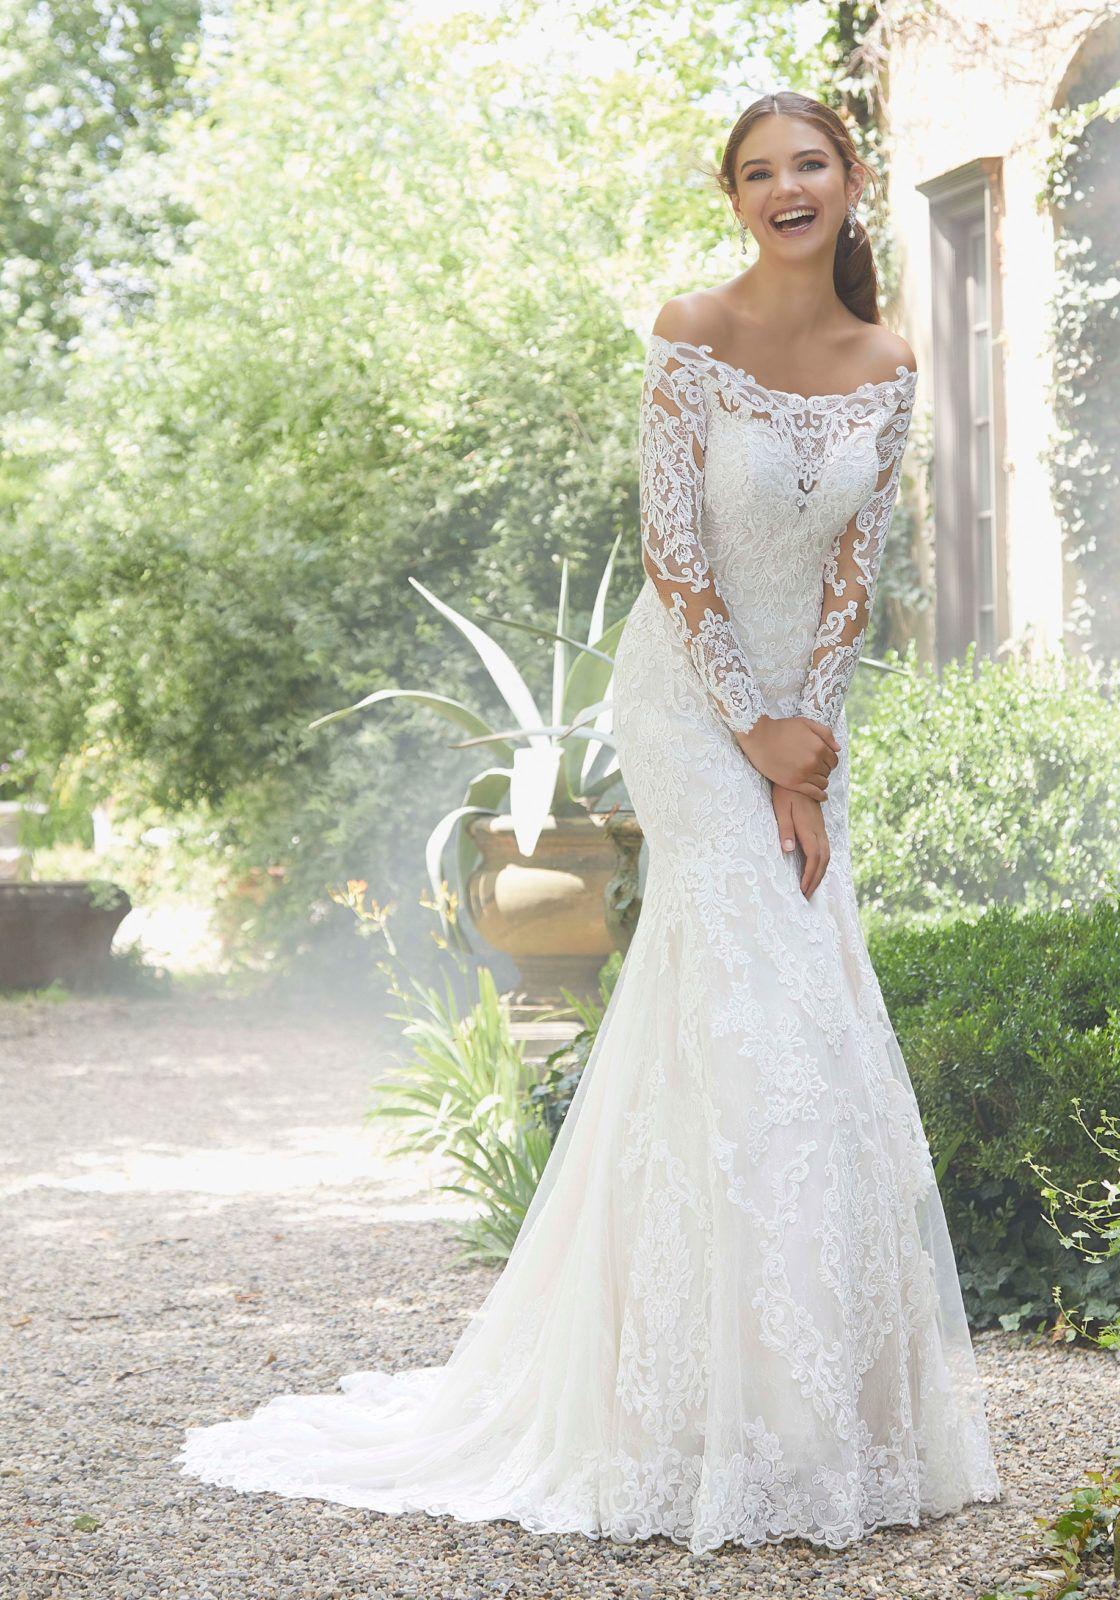 Priscilla Wedding Dress Morilee Fitted Wedding Dress Fit And Flare Wedding Dress Wedding Dresses